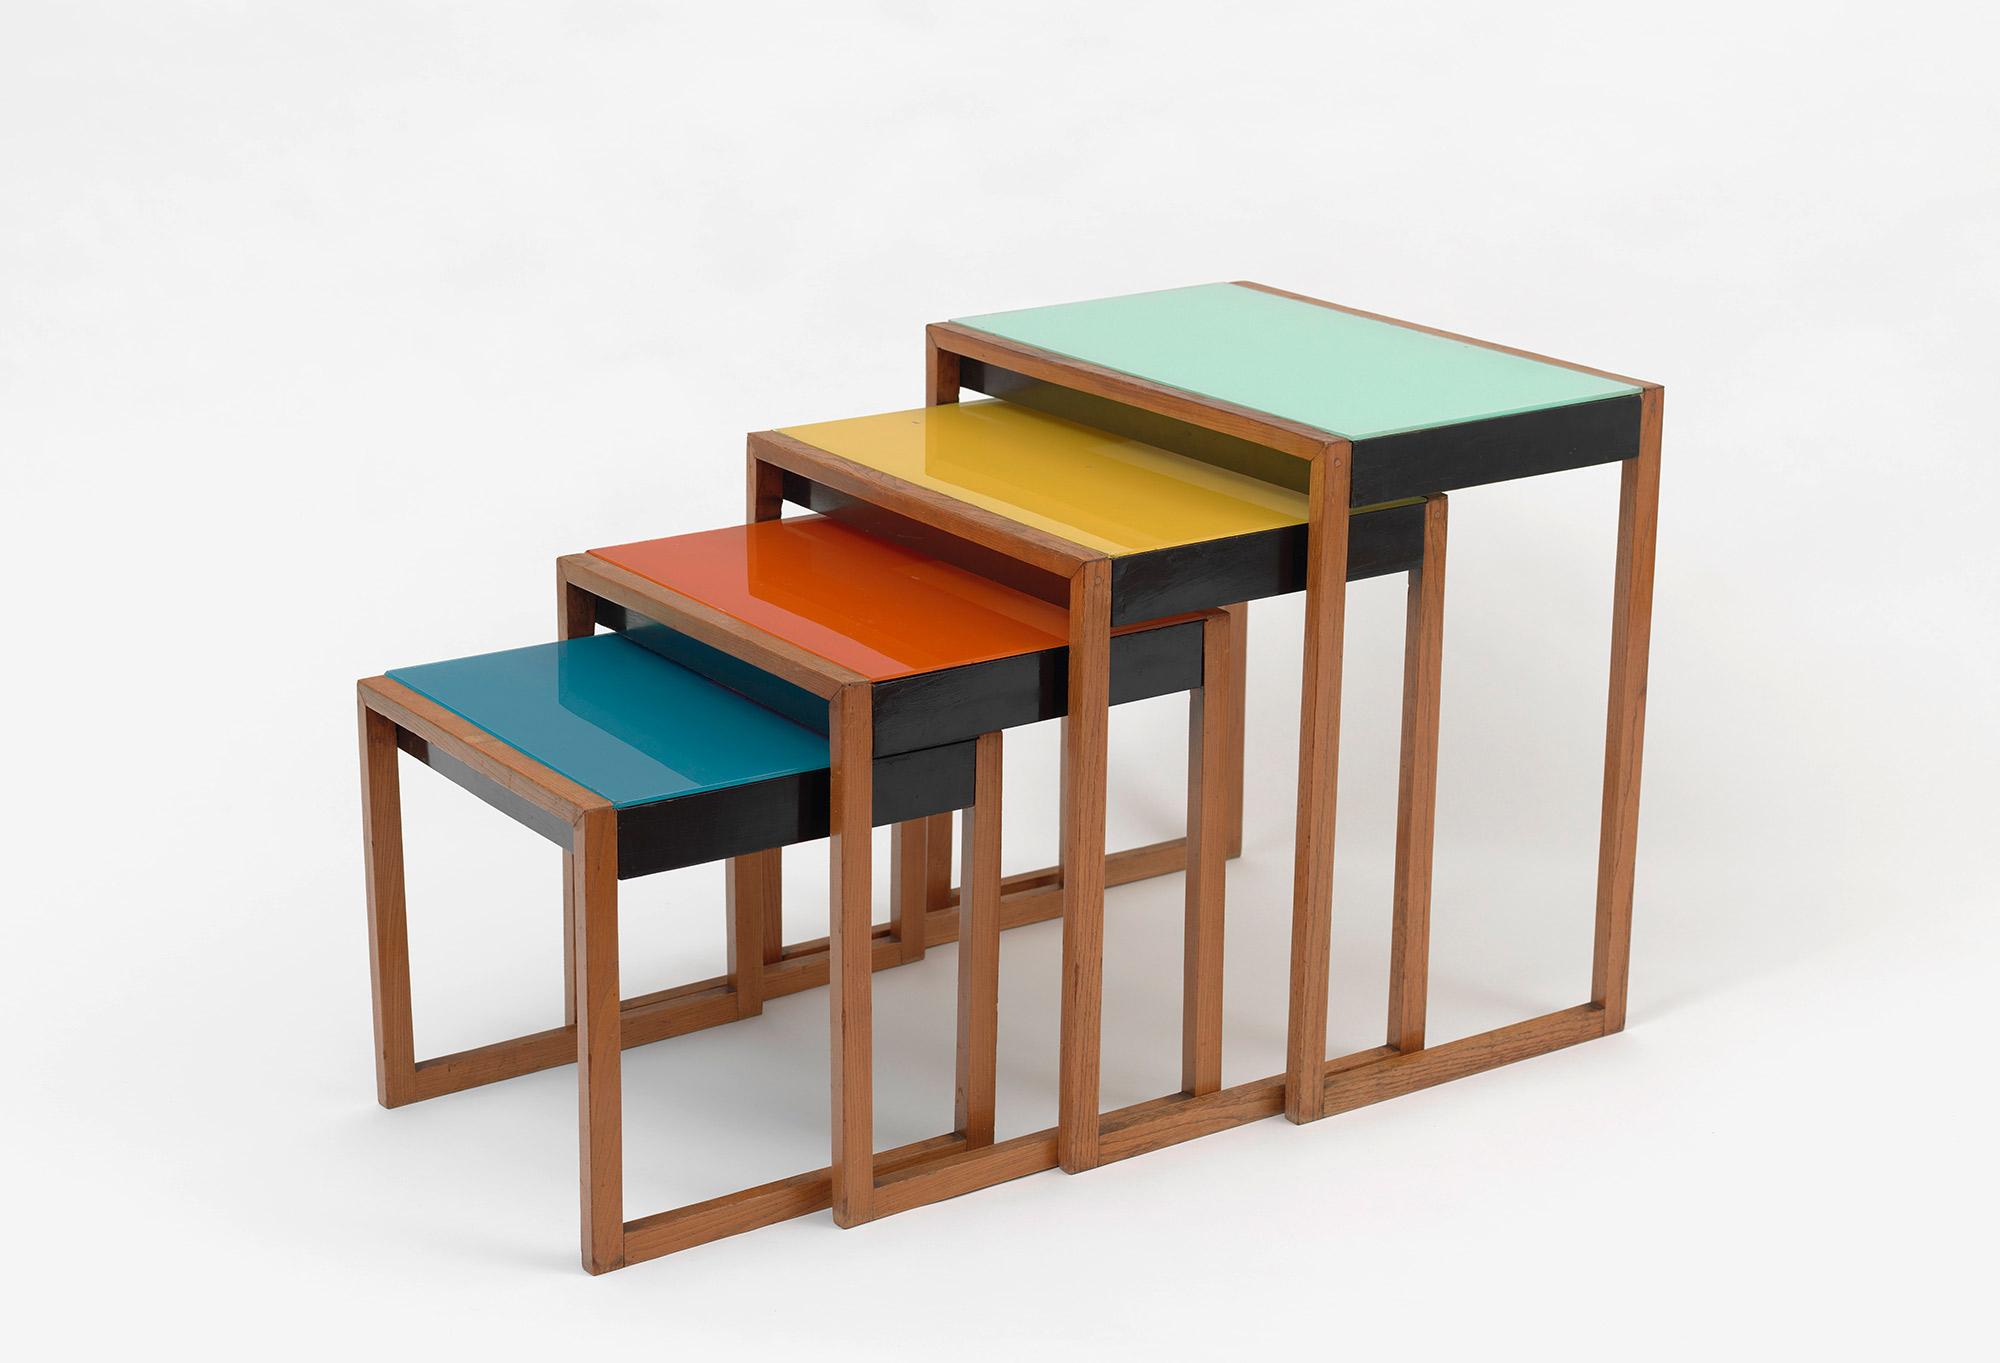 L Espirit Du Bauhaus El Esp Ritu De La Bauhaus Metalocus # Muebles Peter Behrens